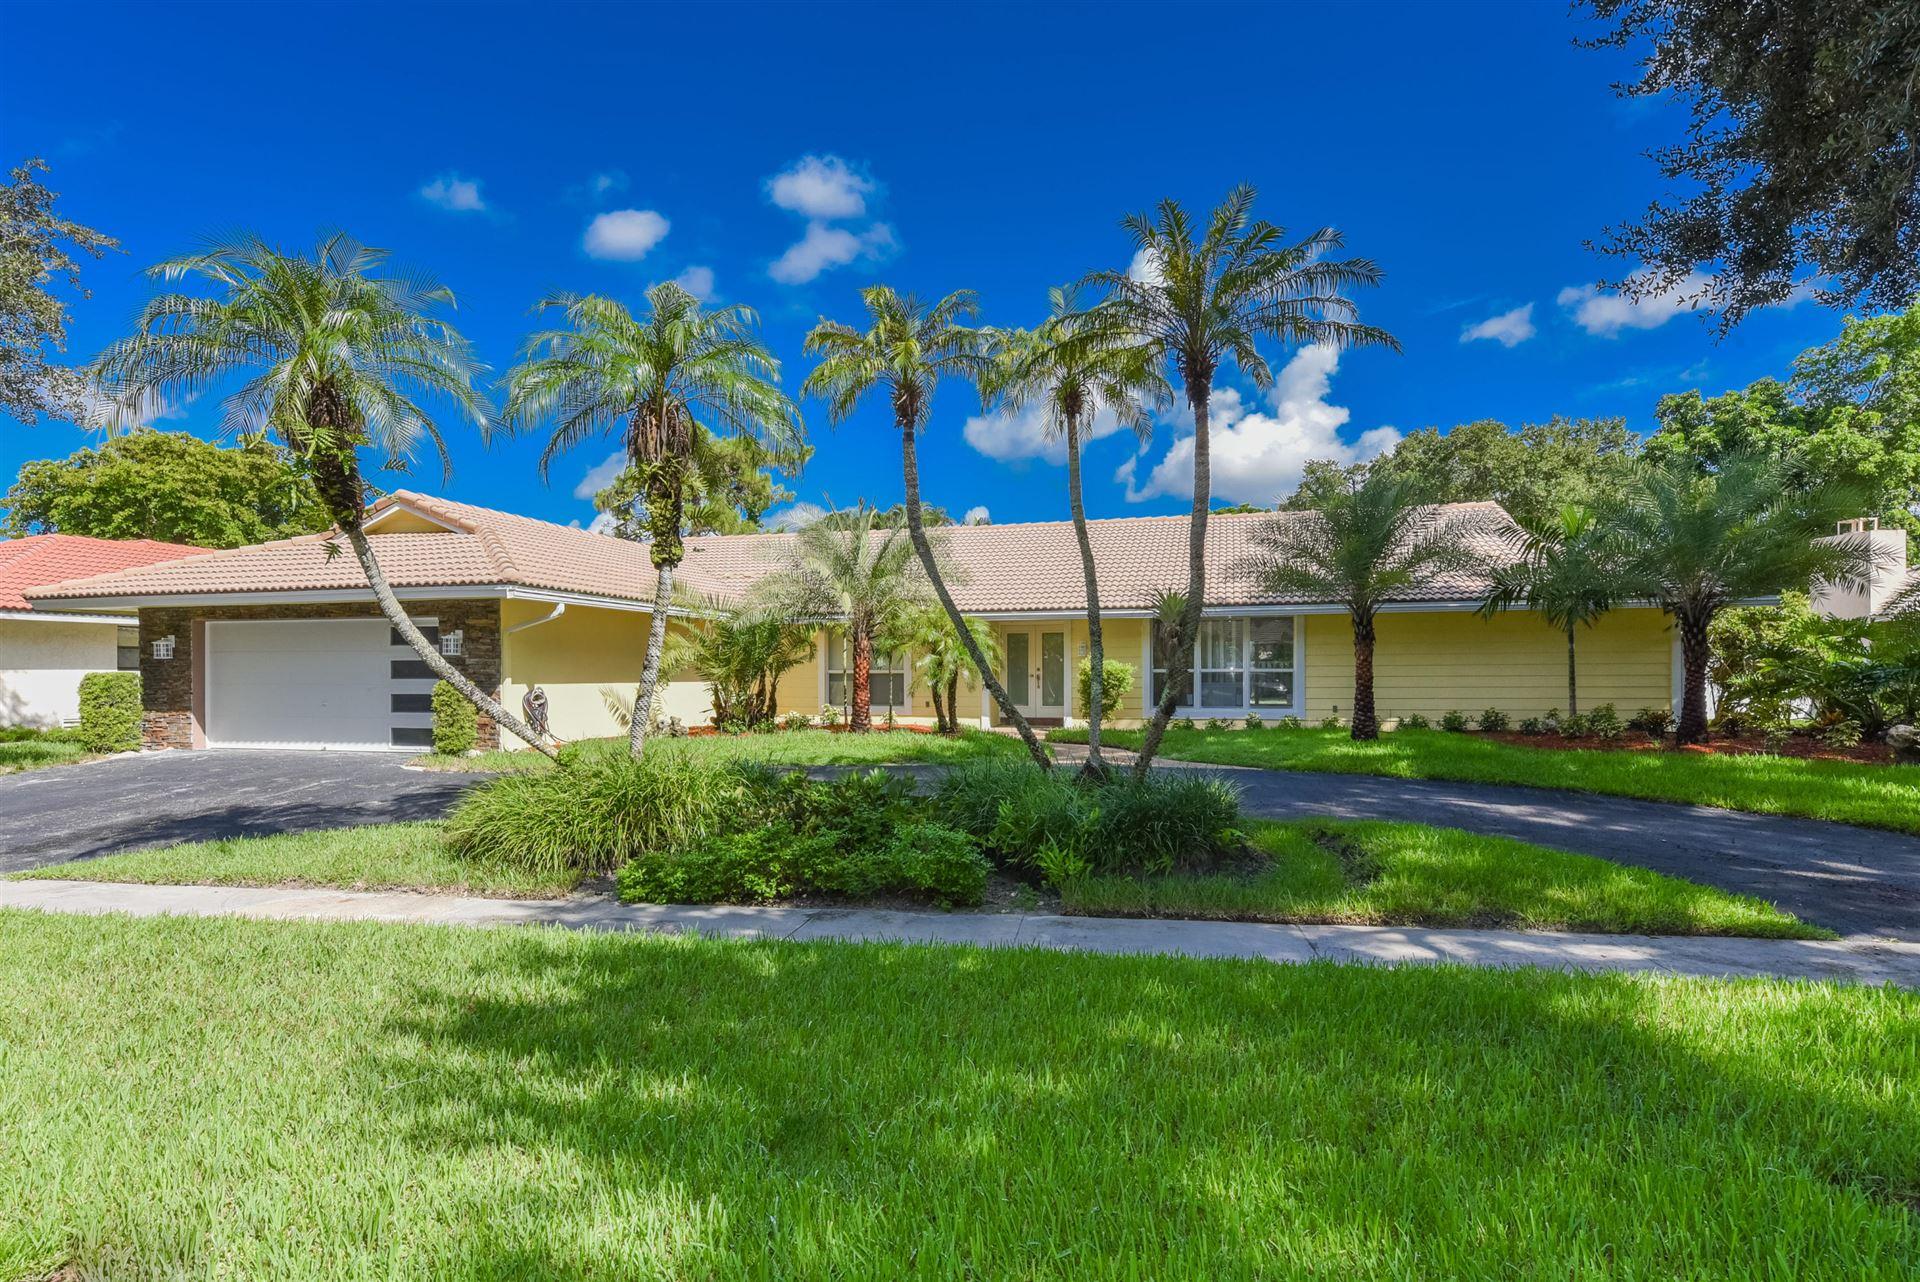 6797 Entrada Place, Boca Raton, FL 33433 - #: RX-10630788